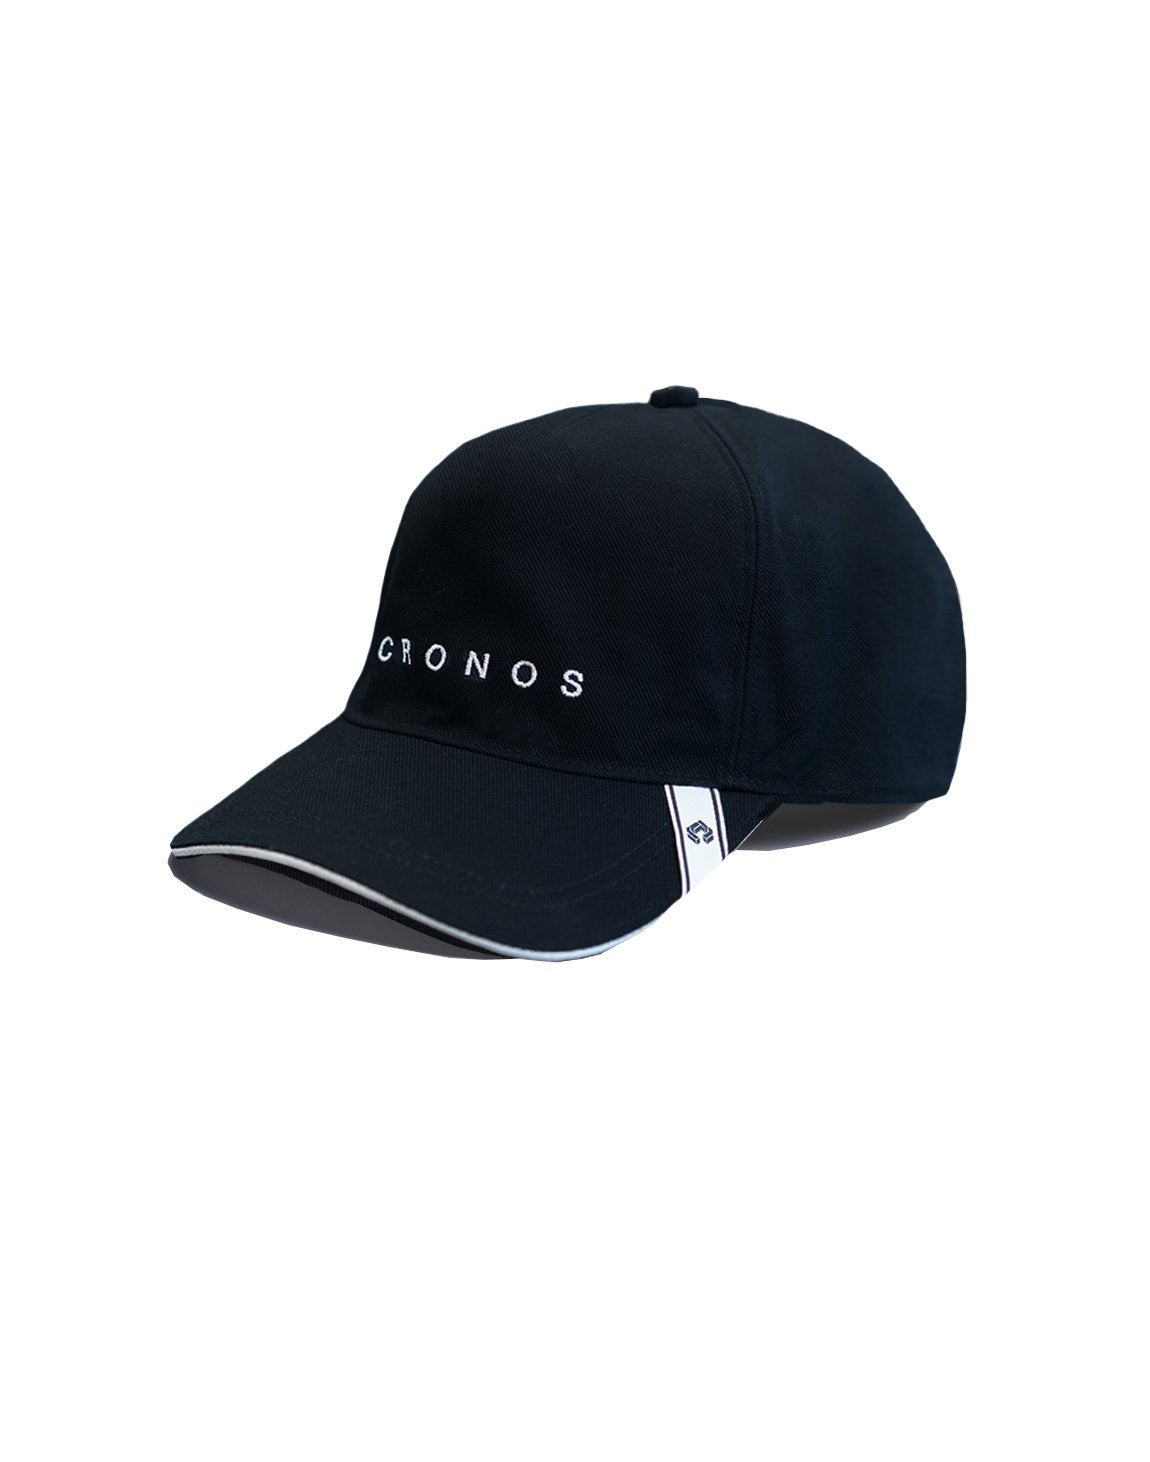 CRONOS FONT LOGO CAP【BLACK】